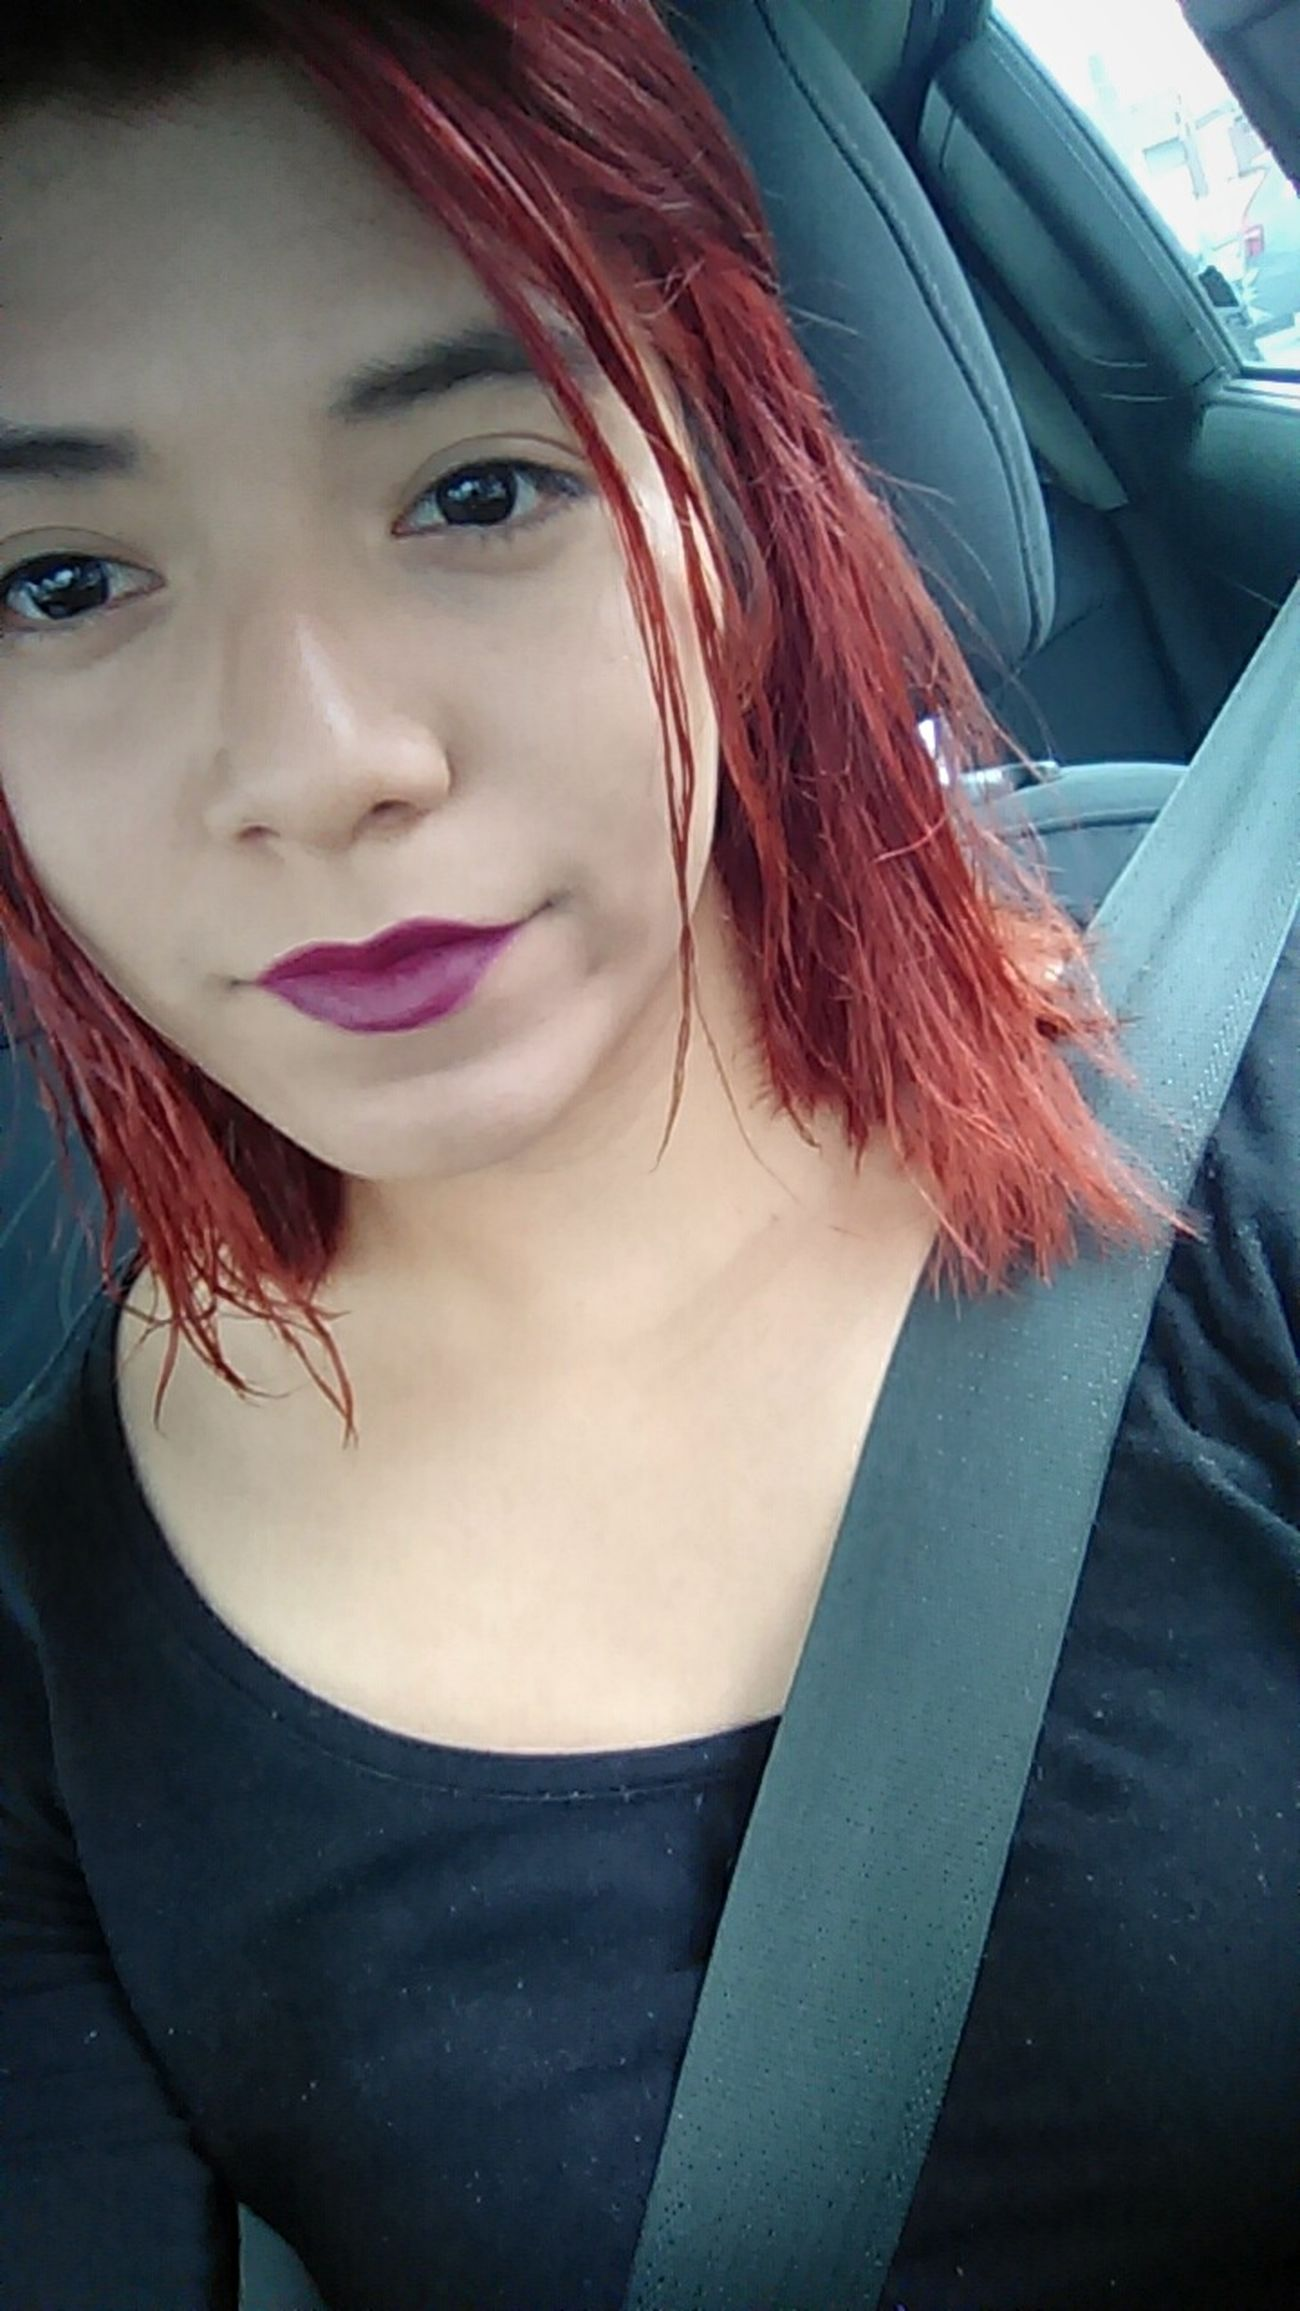 Redhaır ❤ Redhairgirl Redhairdon'tcare